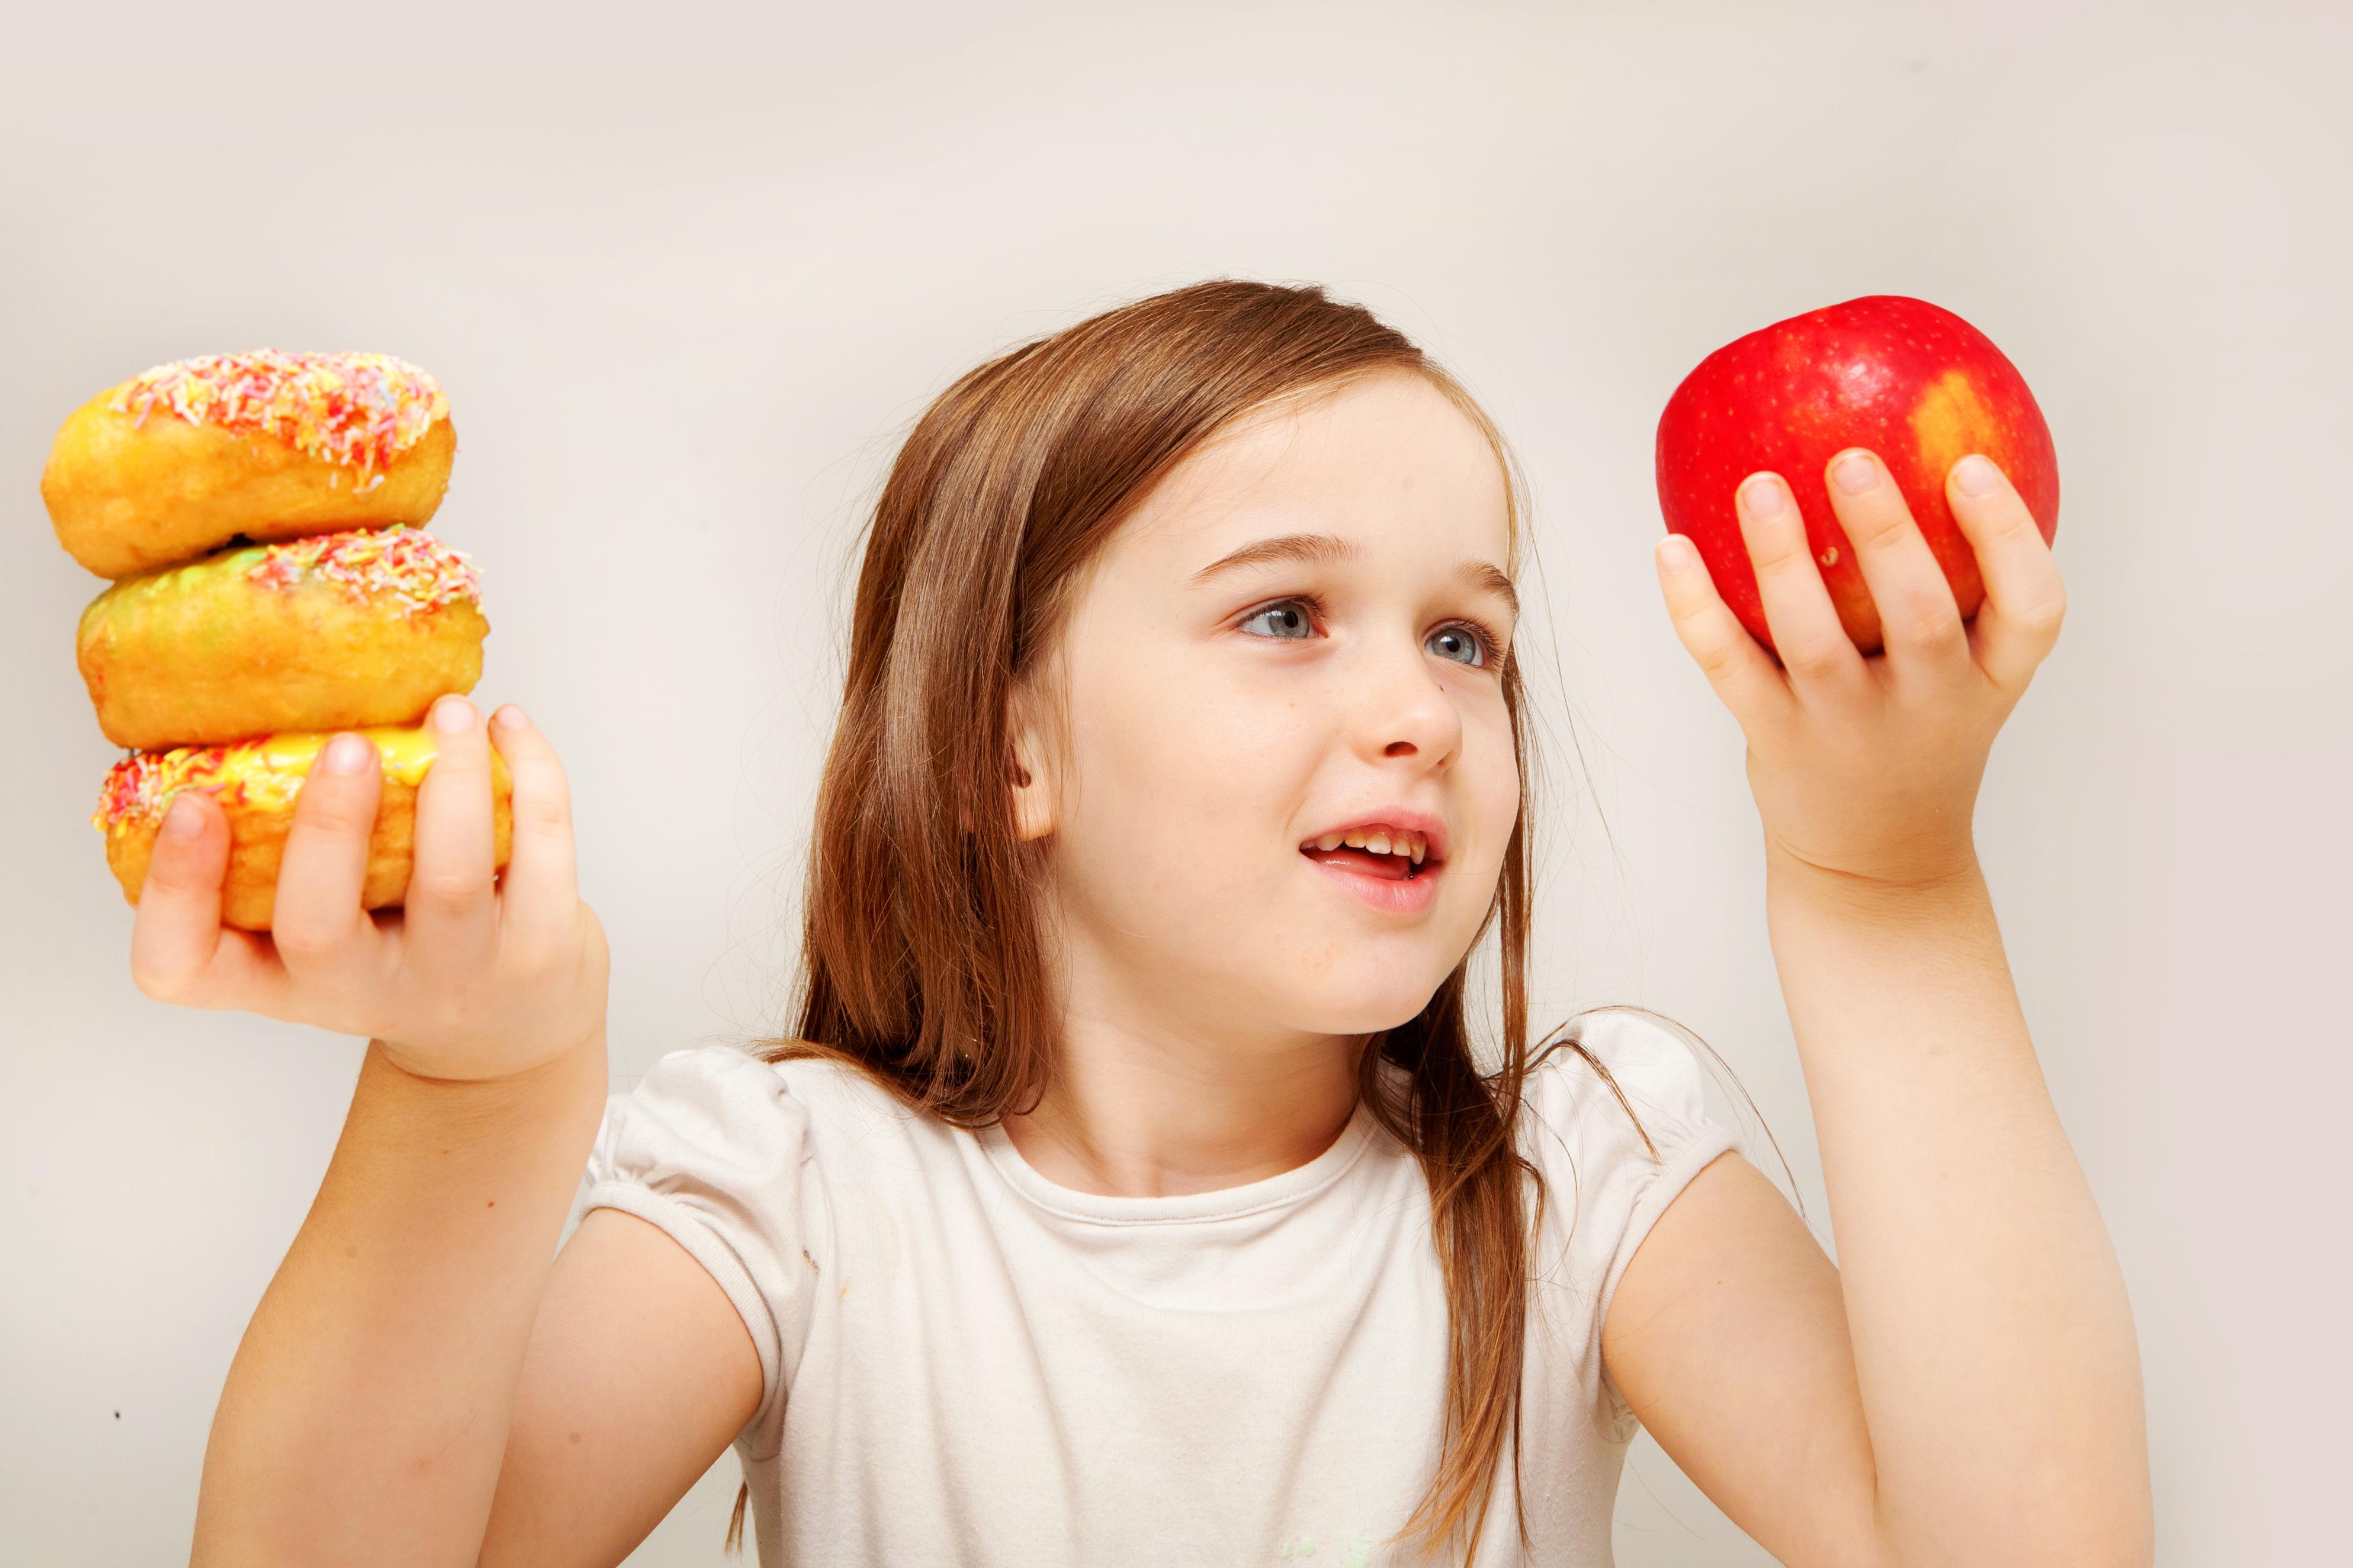 Black fast food diabetes young girls girls